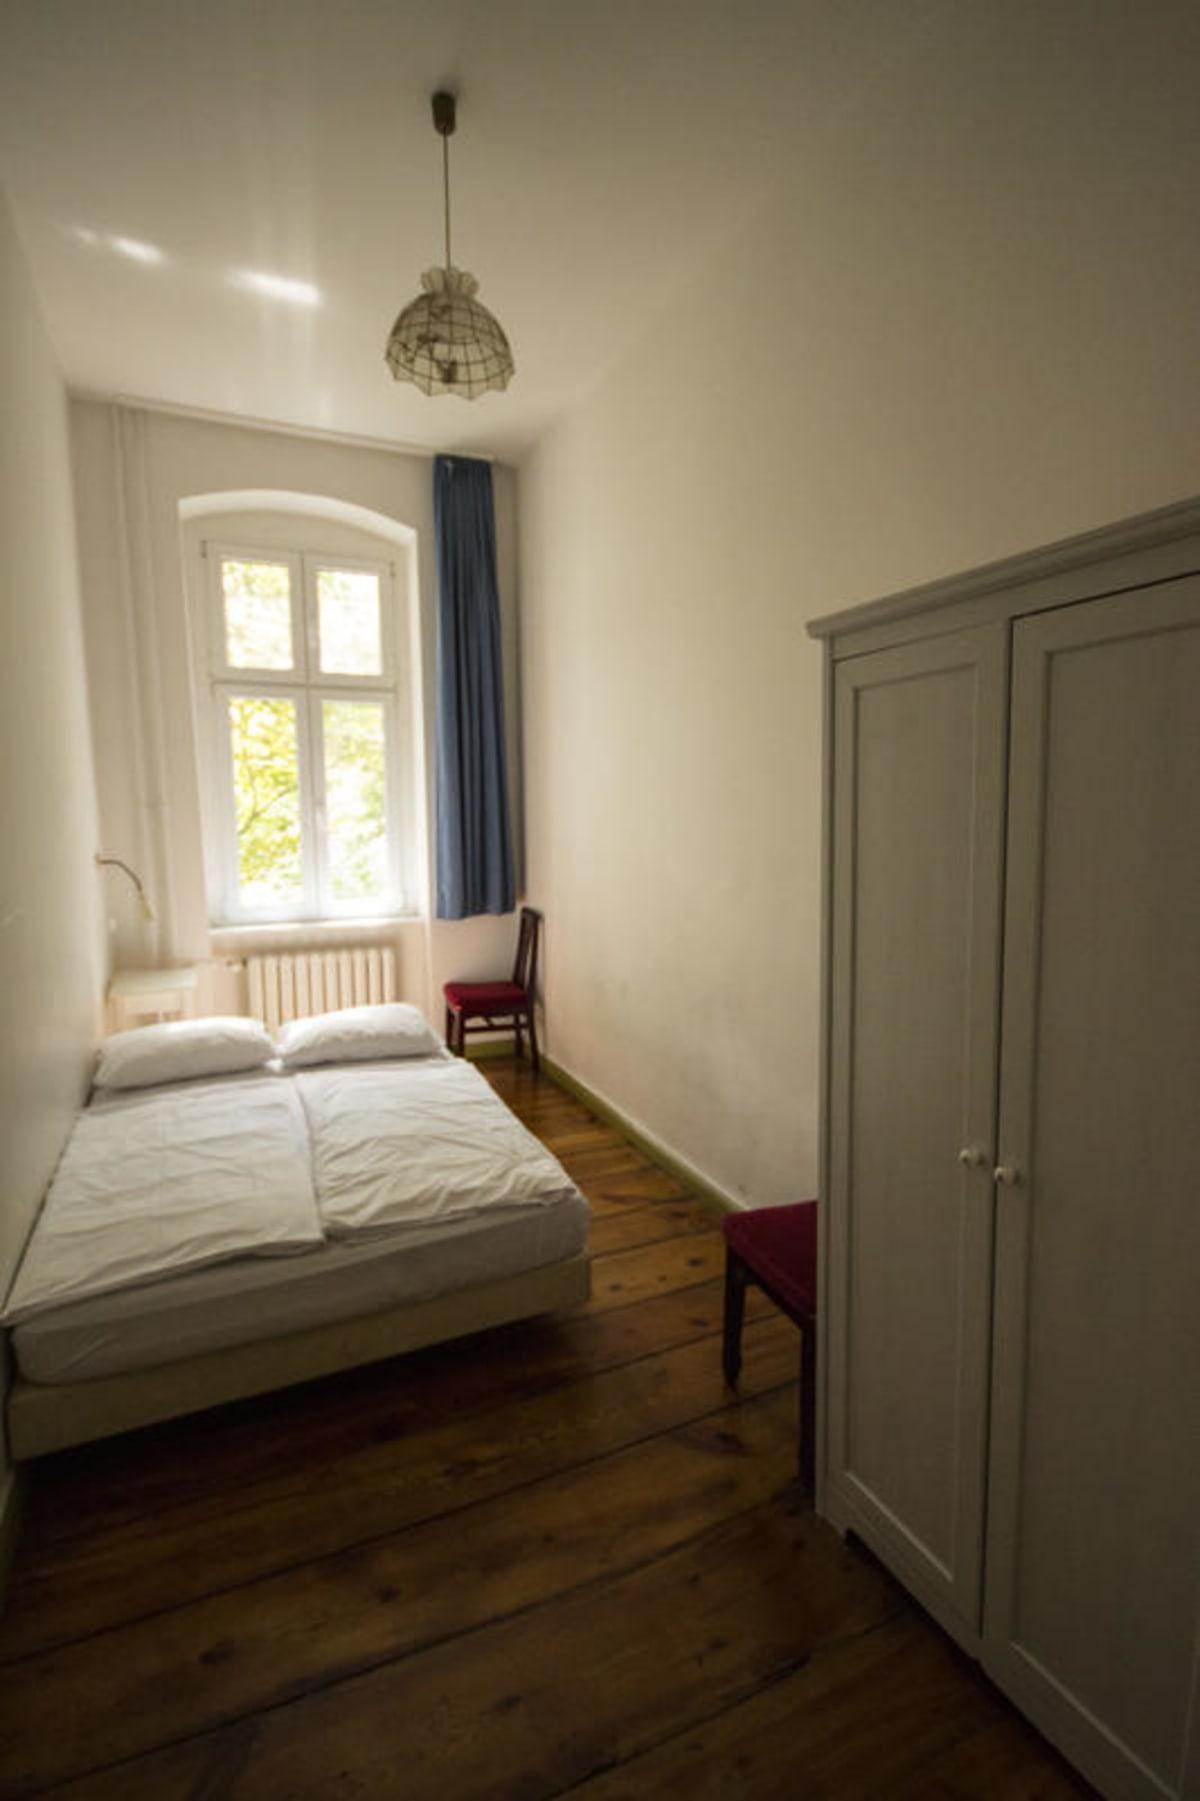 36 ROOMS Berlin Kreuzberg, Berlin, Germany hostel